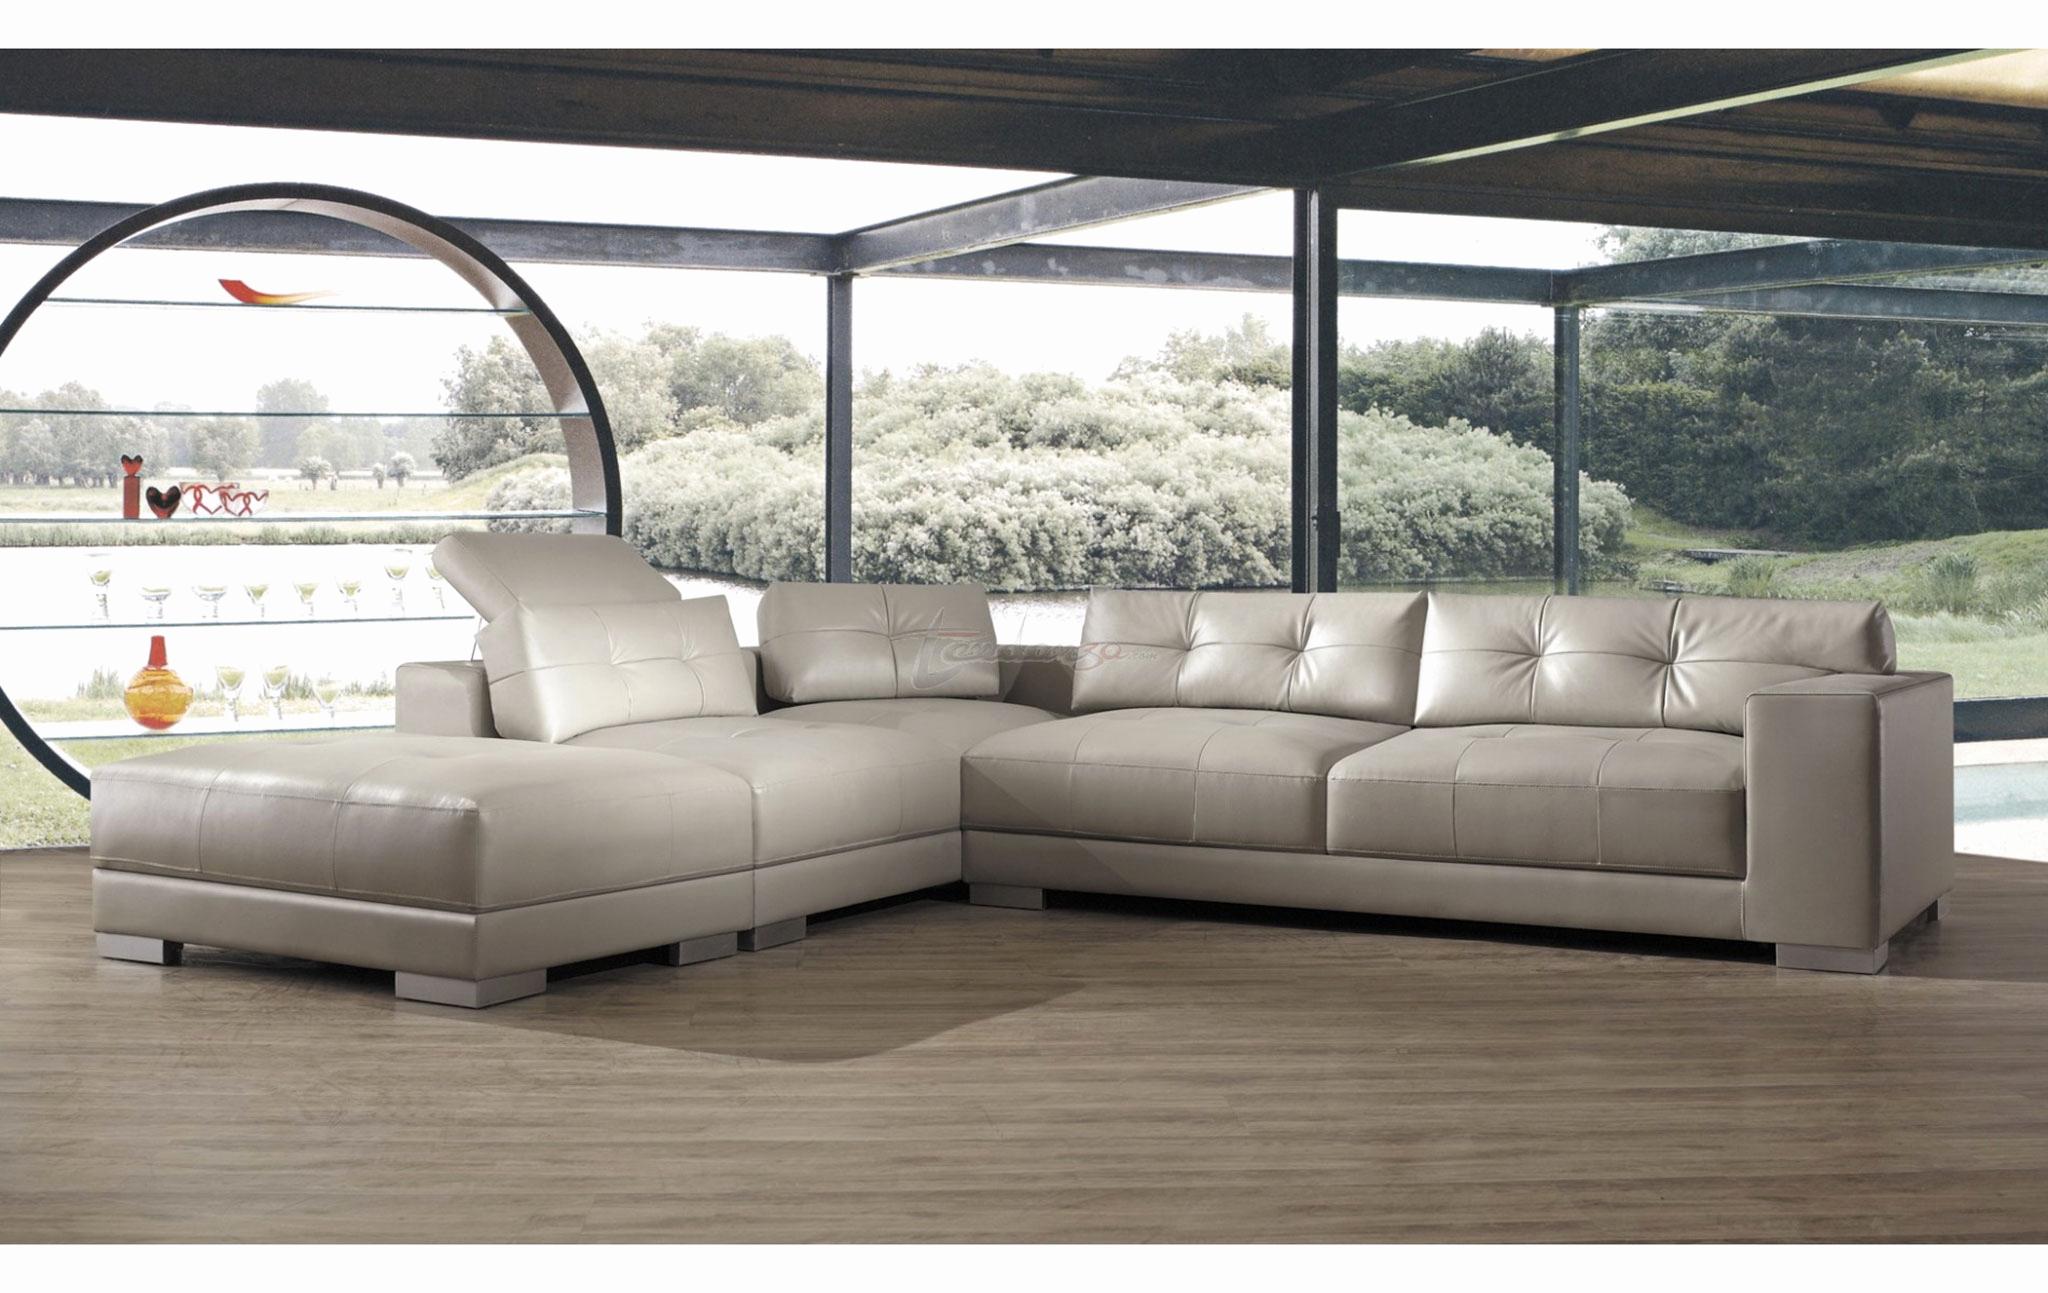 Canape Cuir Blanc Ikea Luxe Photos 29 Inspirant Canape Angle Pas Cher Design